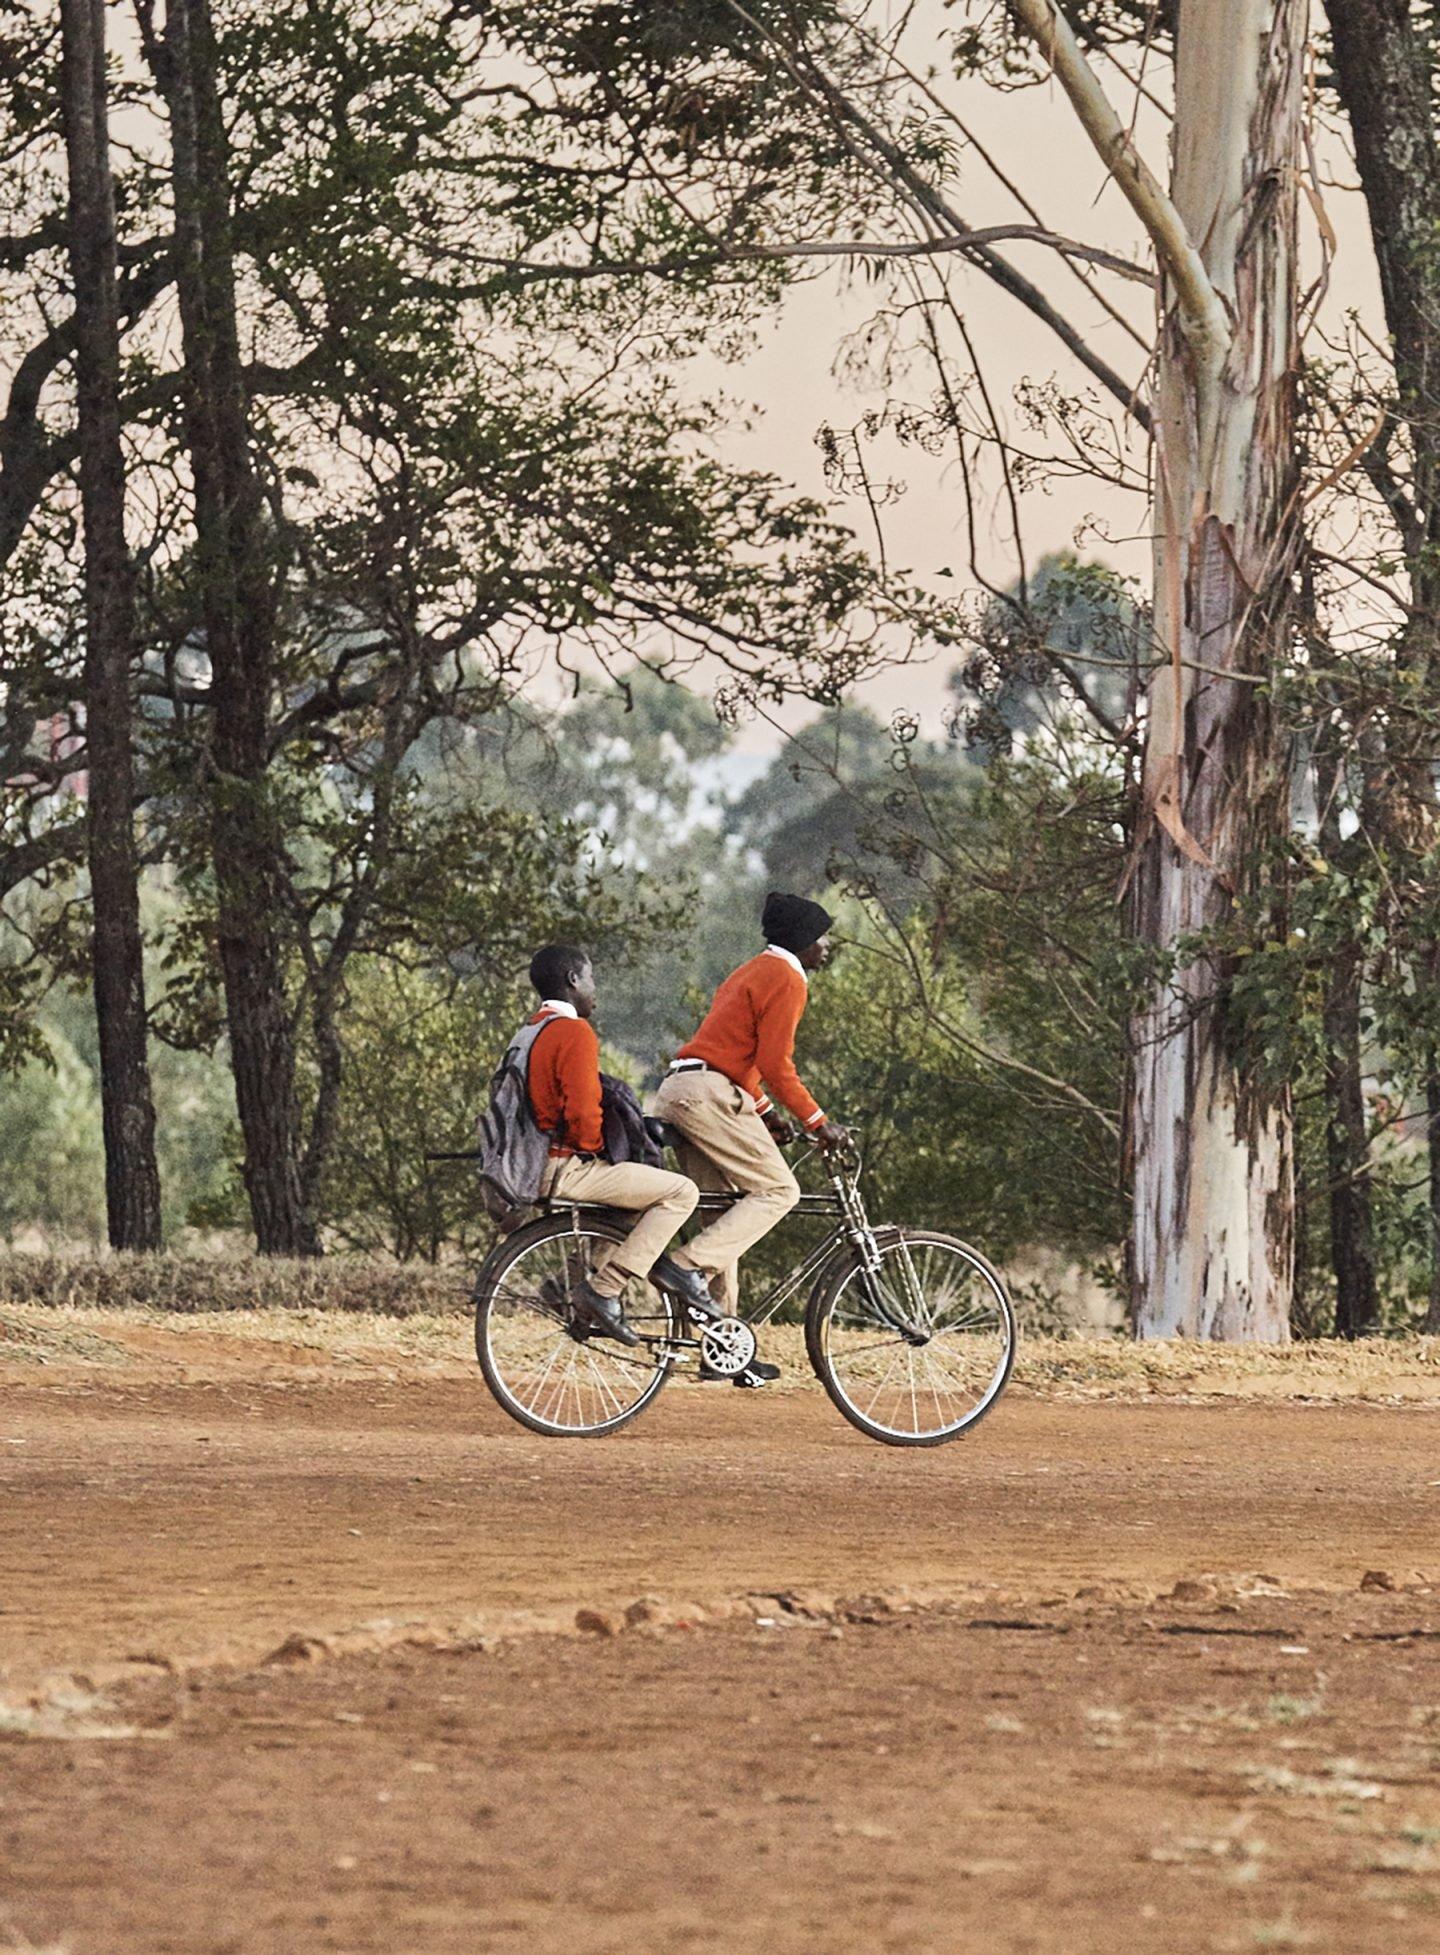 Kenya shot by Cait Oppermann